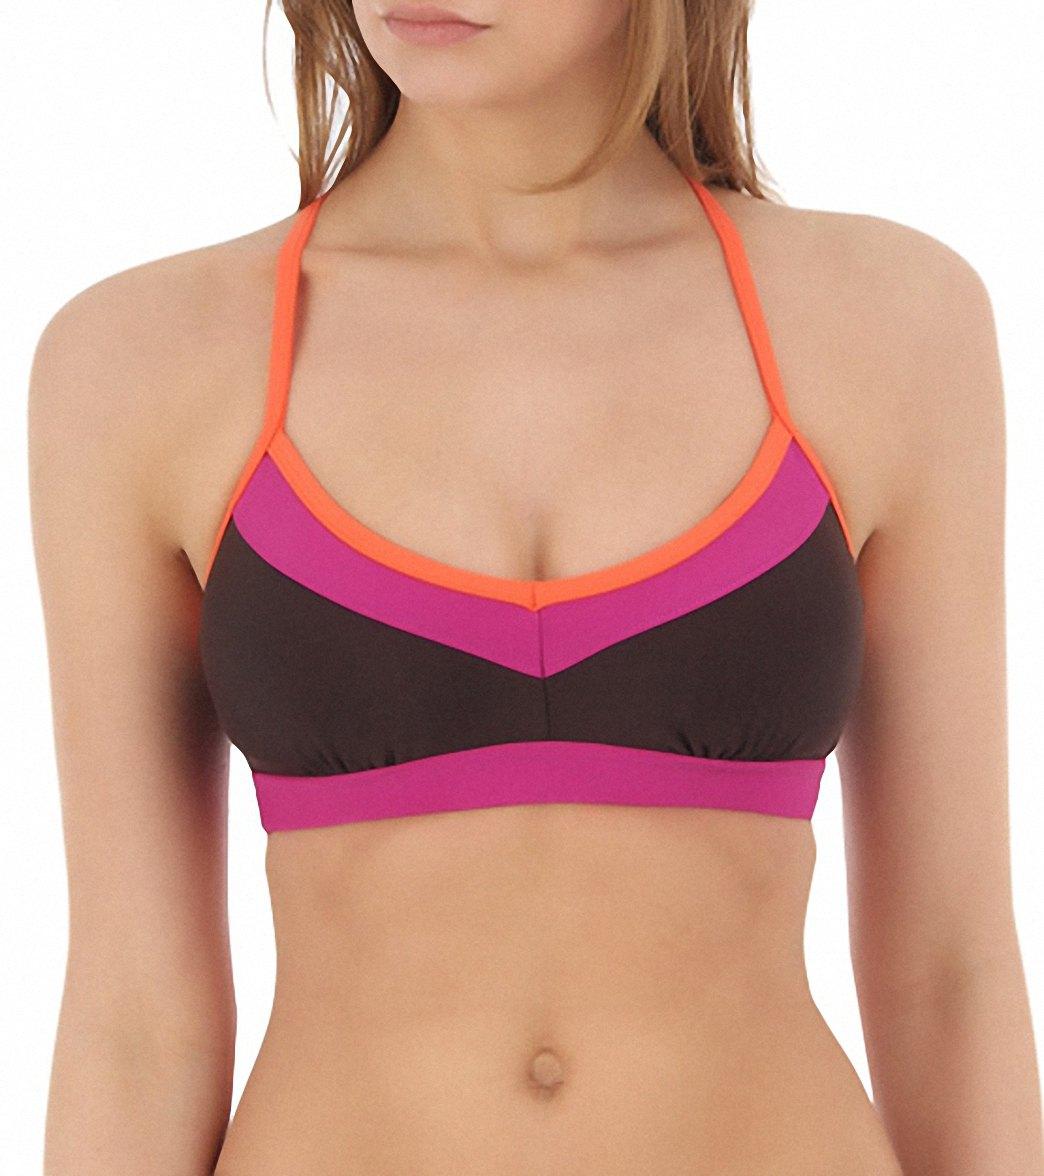 f89cf3581d668 prAna Trinidad Bikini Top at SwimOutlet.com - Free Shipping